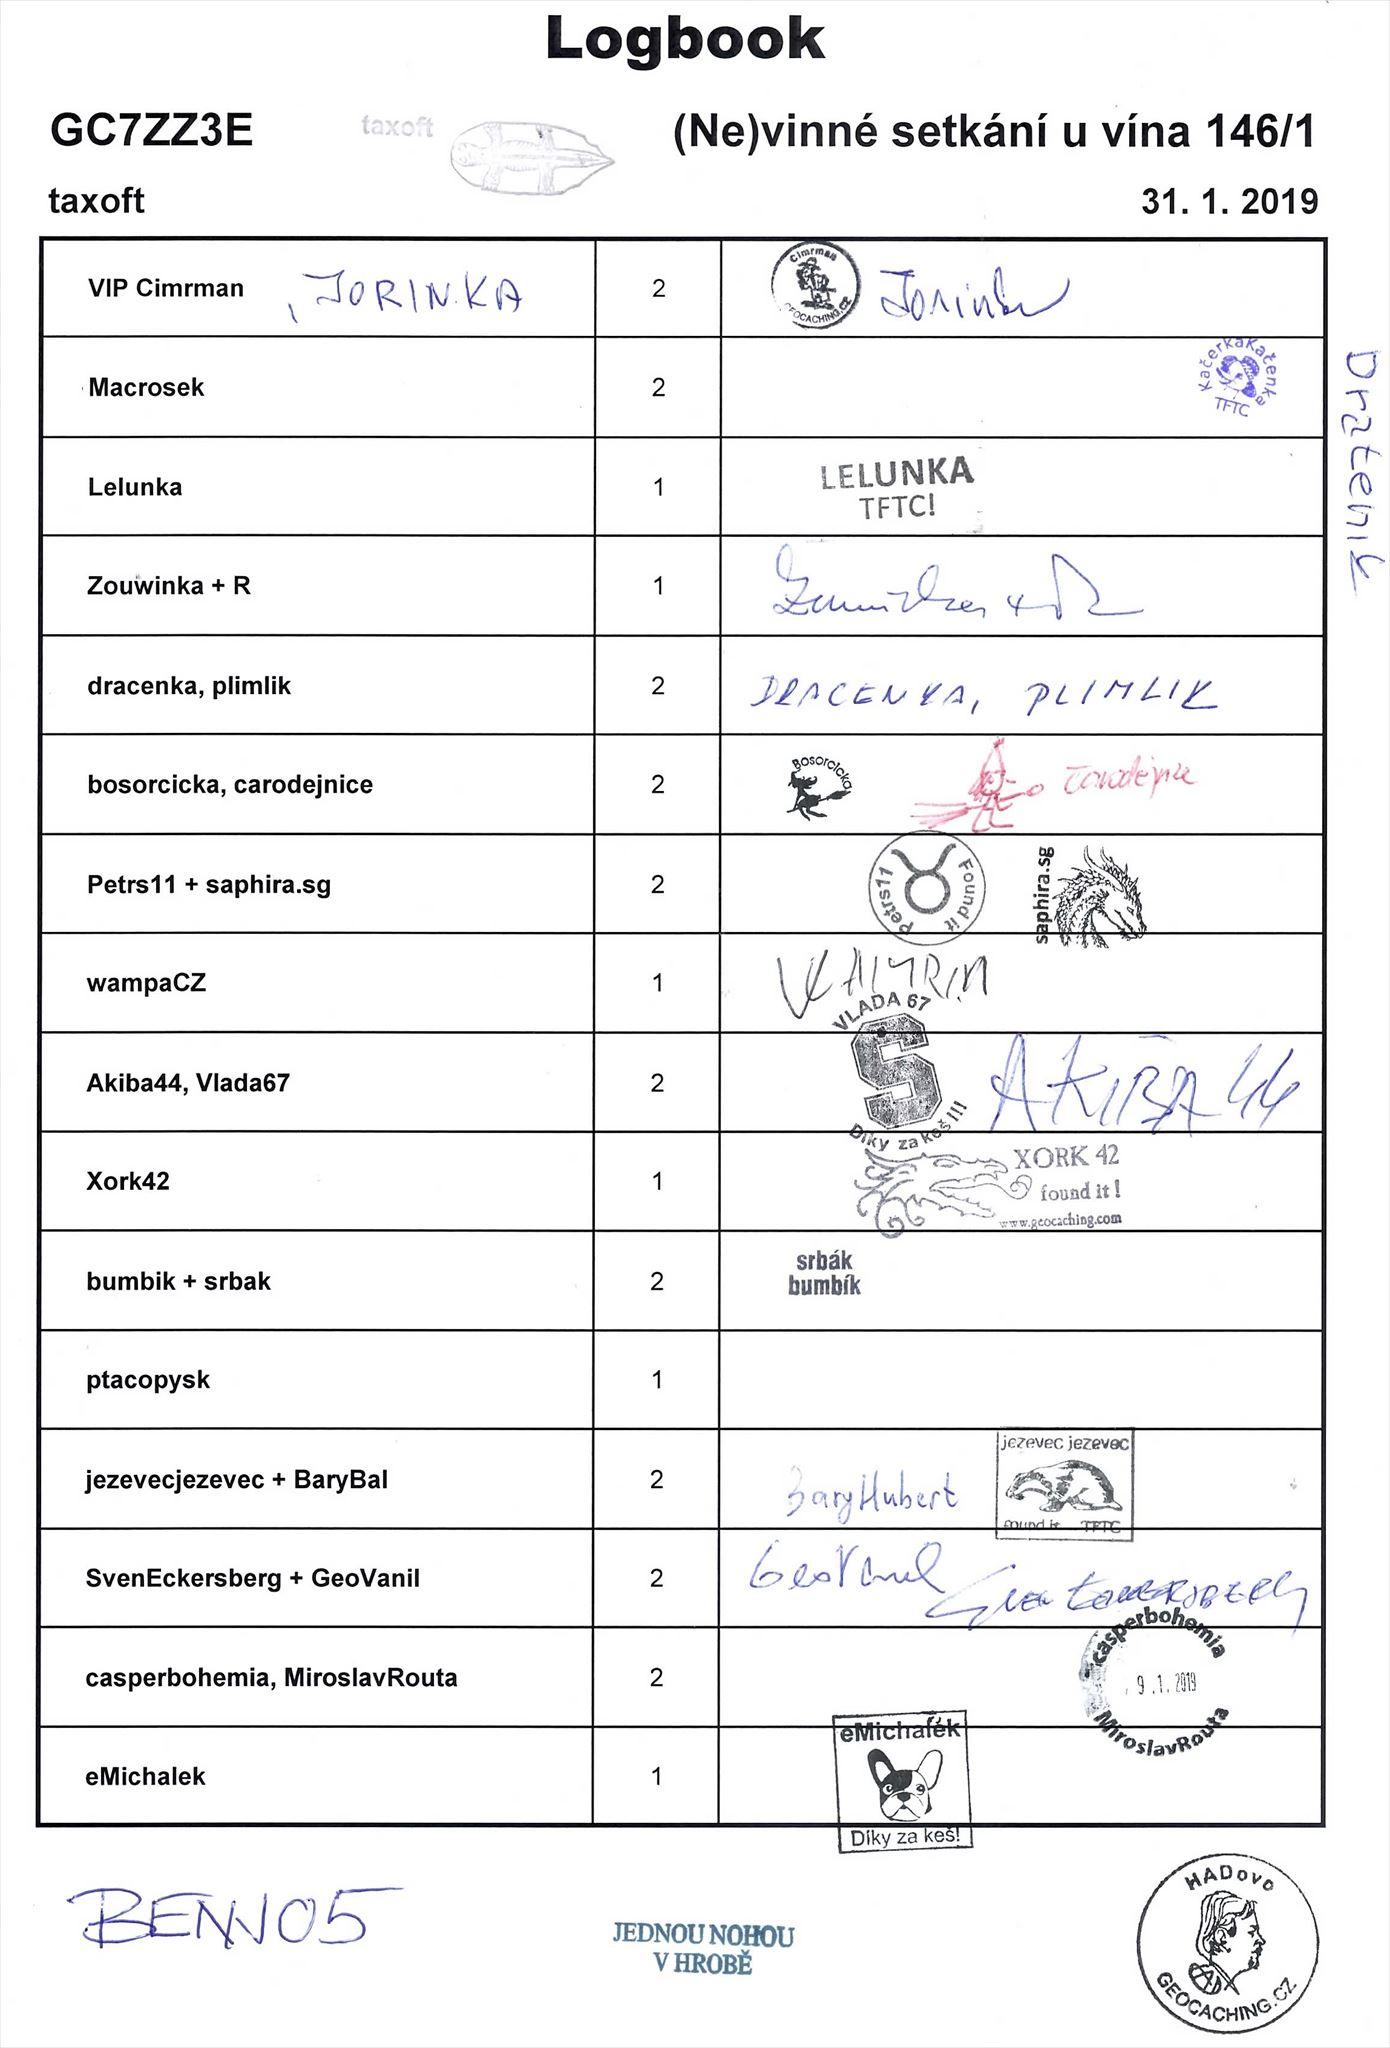 GC7ZZ3E - (Ne)vinné setkání u vína 146/1 - logbook